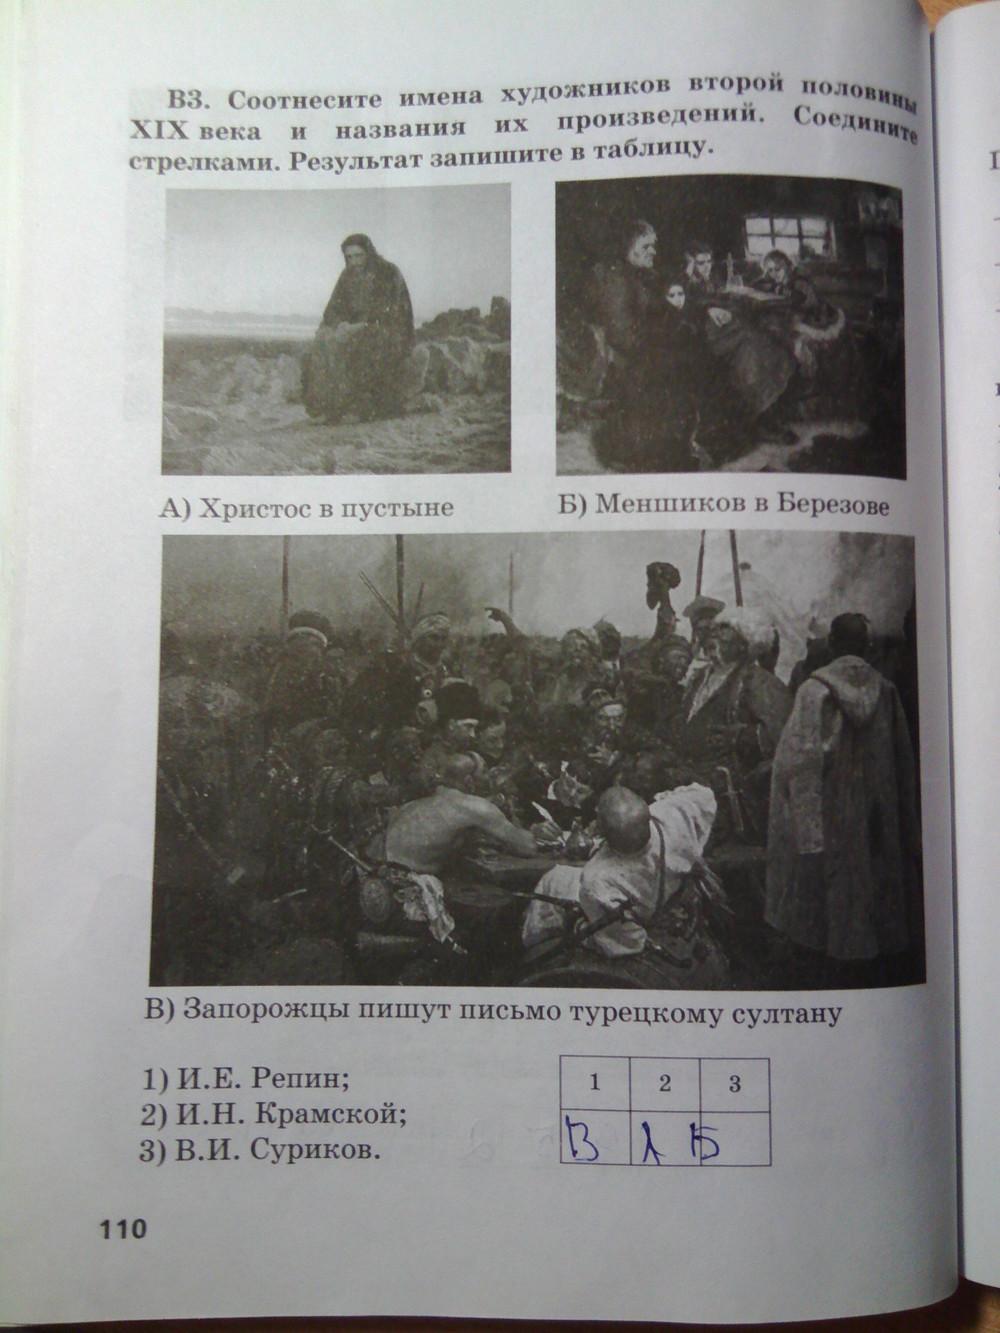 Гдз по тетради истории 8 класс кружалов ответы